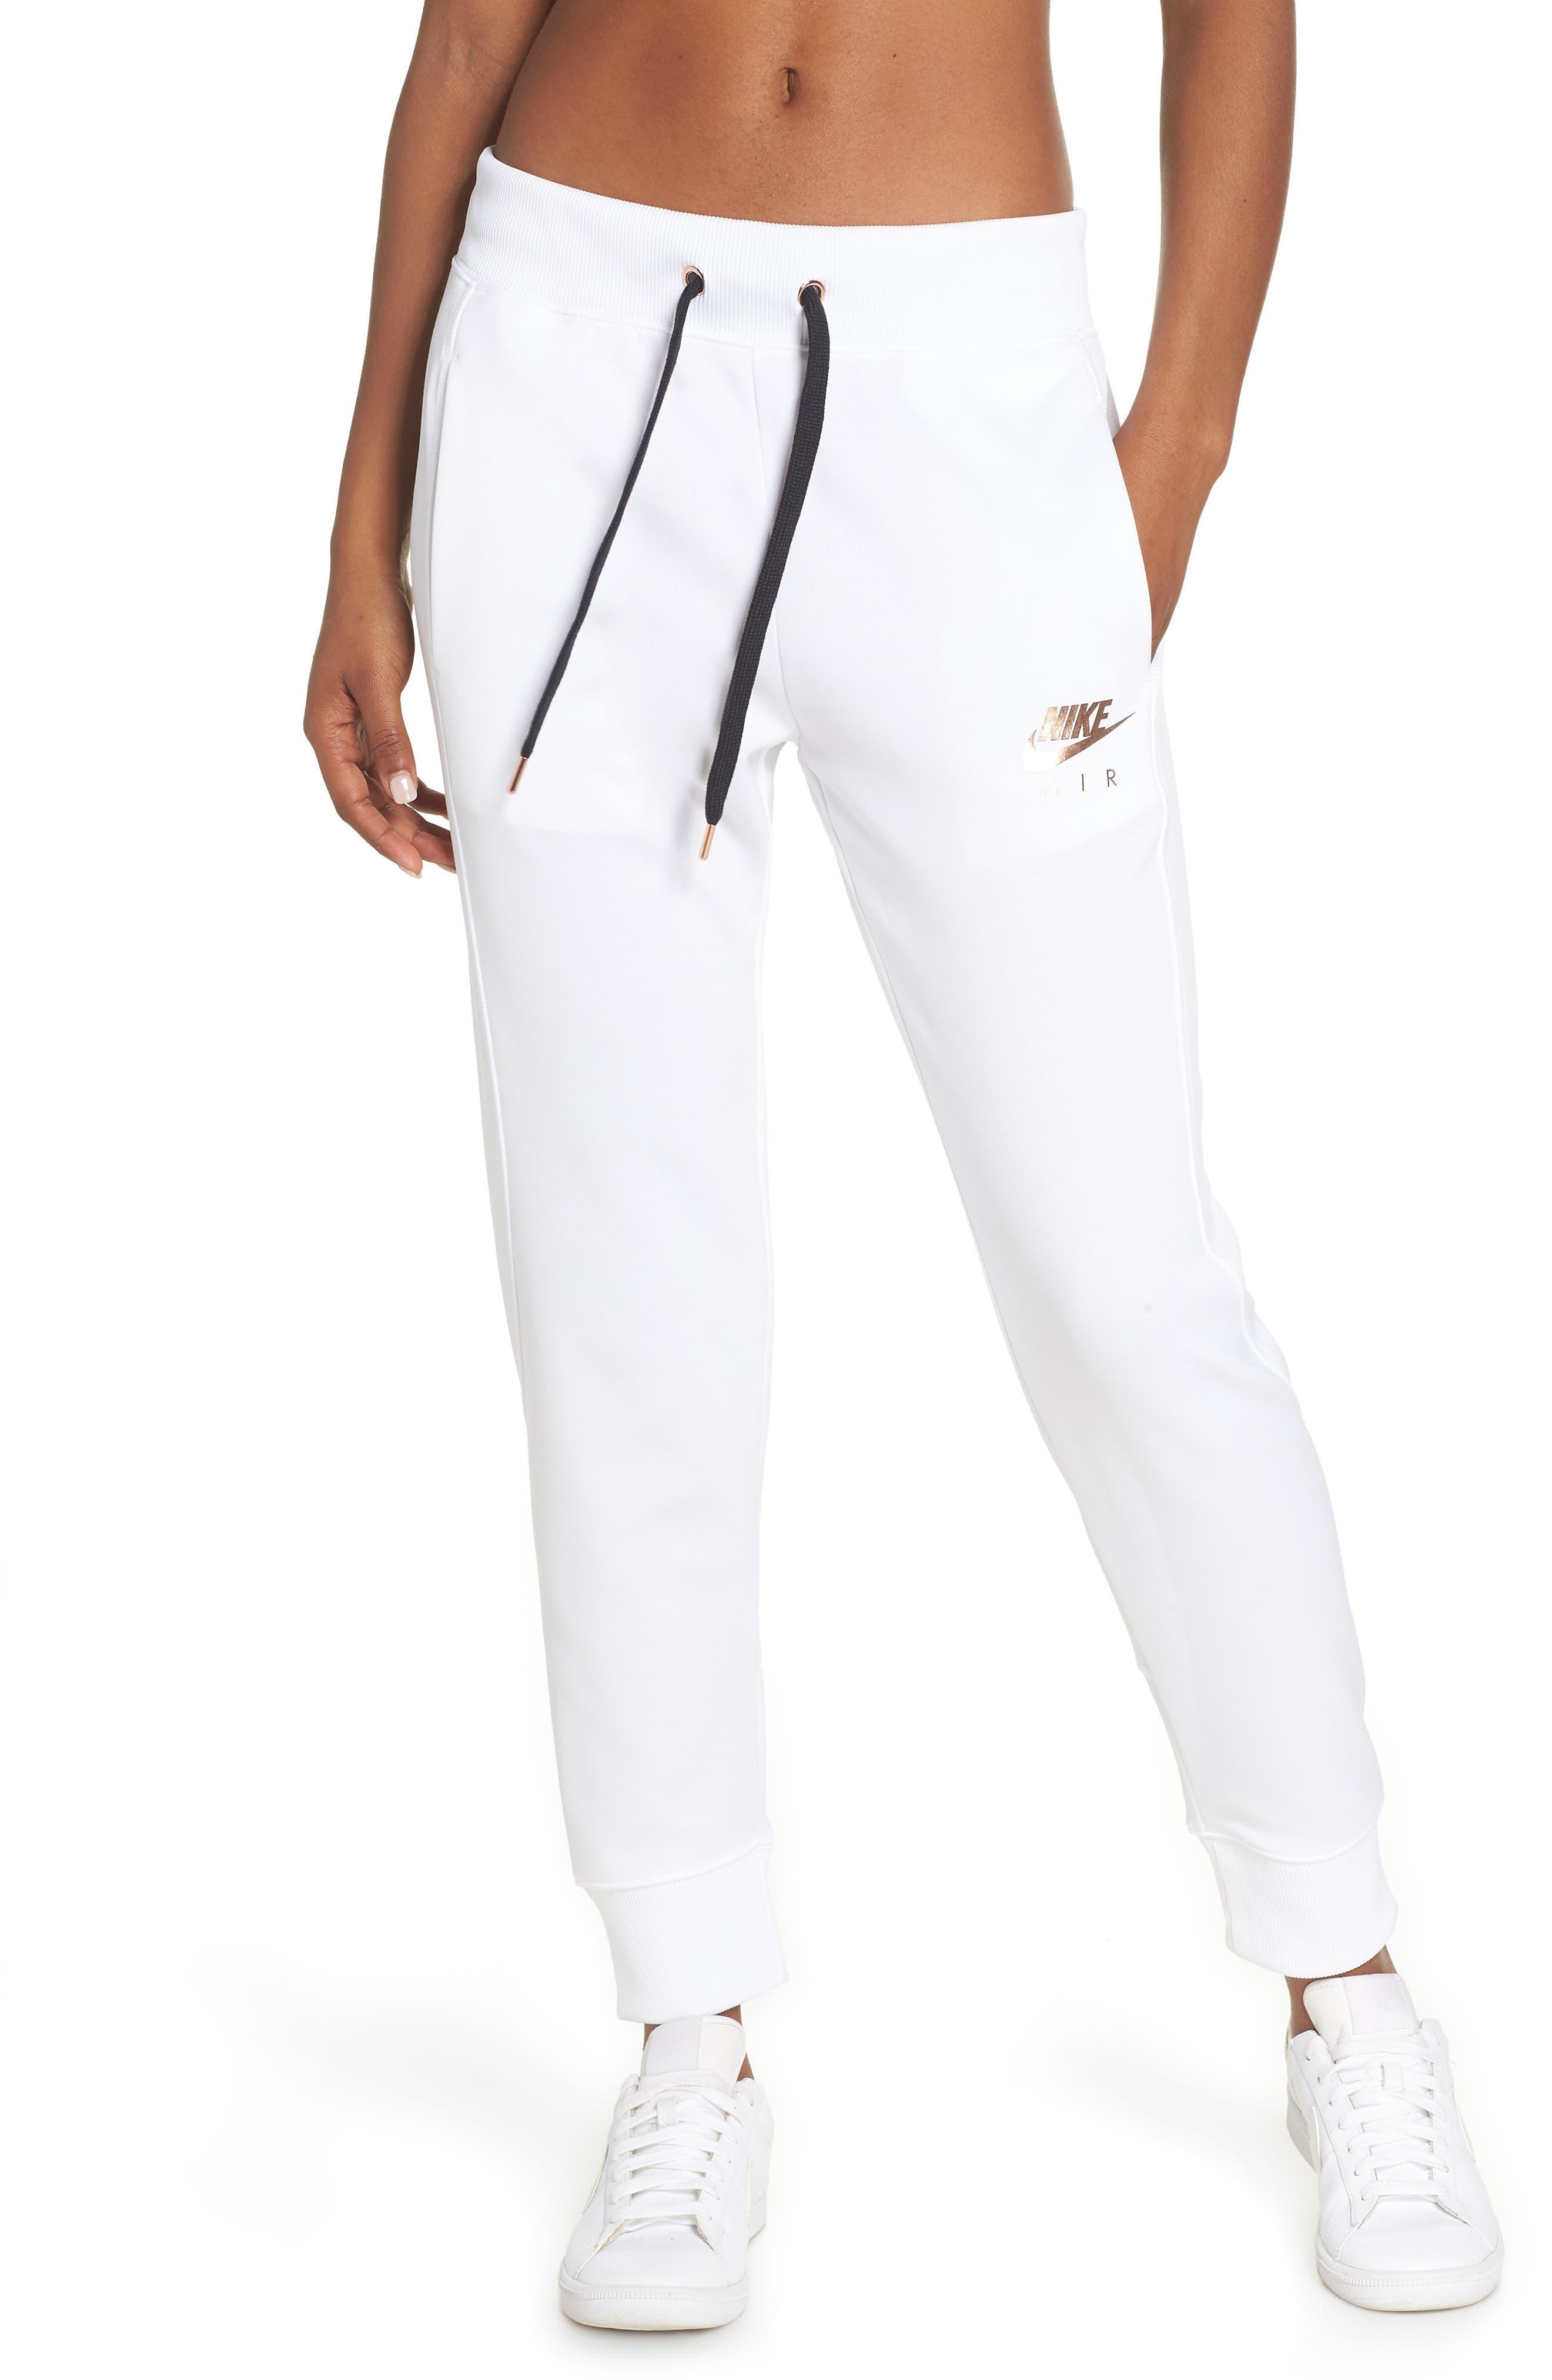 Sportswear Air Jogger Pants,                         Main,                         color, WHITE/ ROSE GOLD/ BLACK